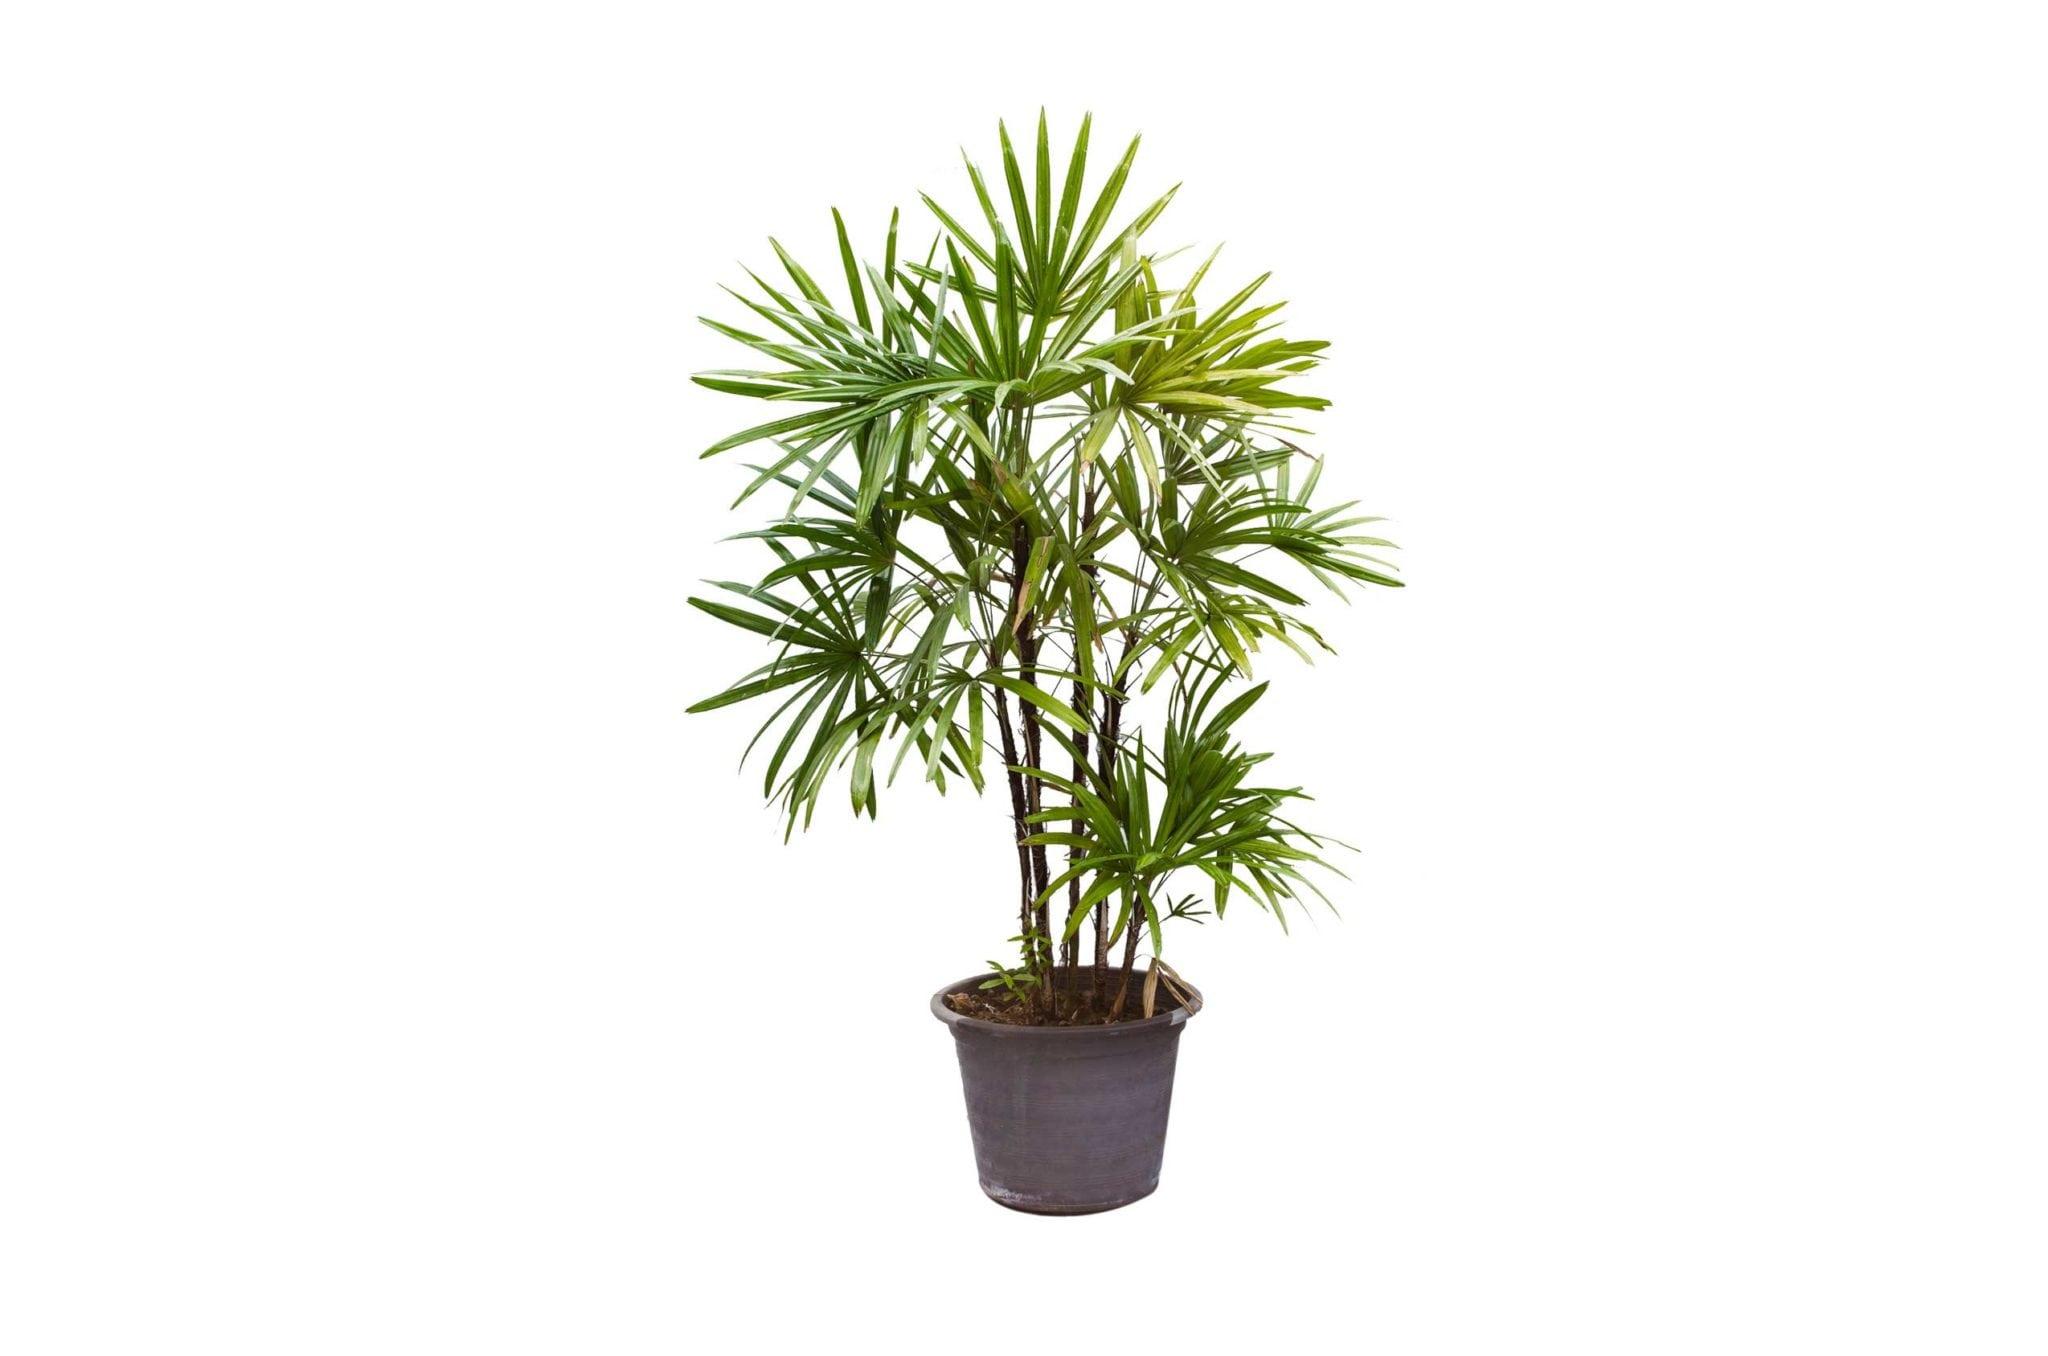 9. Lady Palm